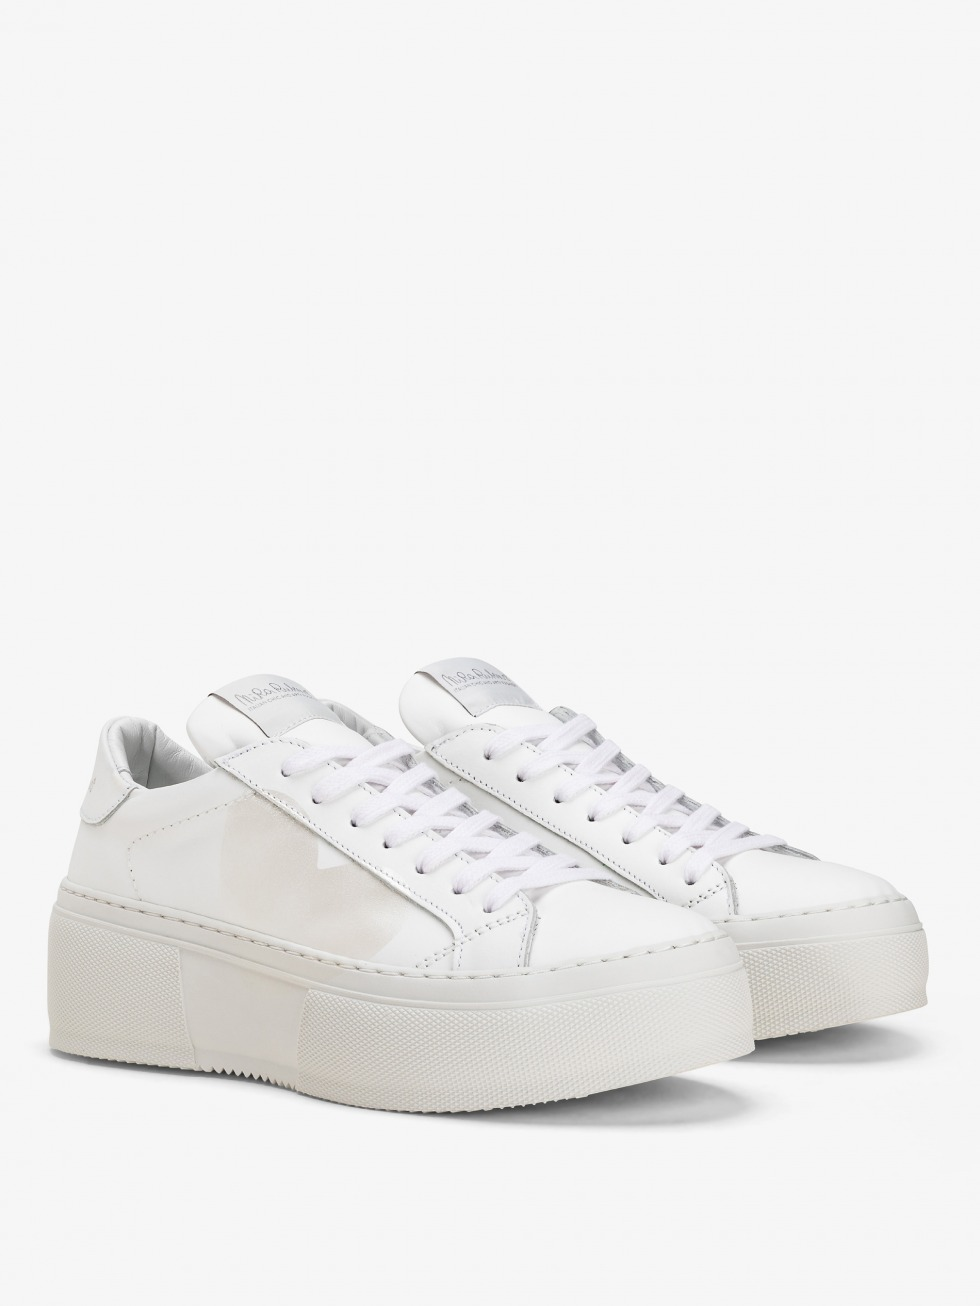 Platform Sneakers Mimosa - Cuore Madreperla